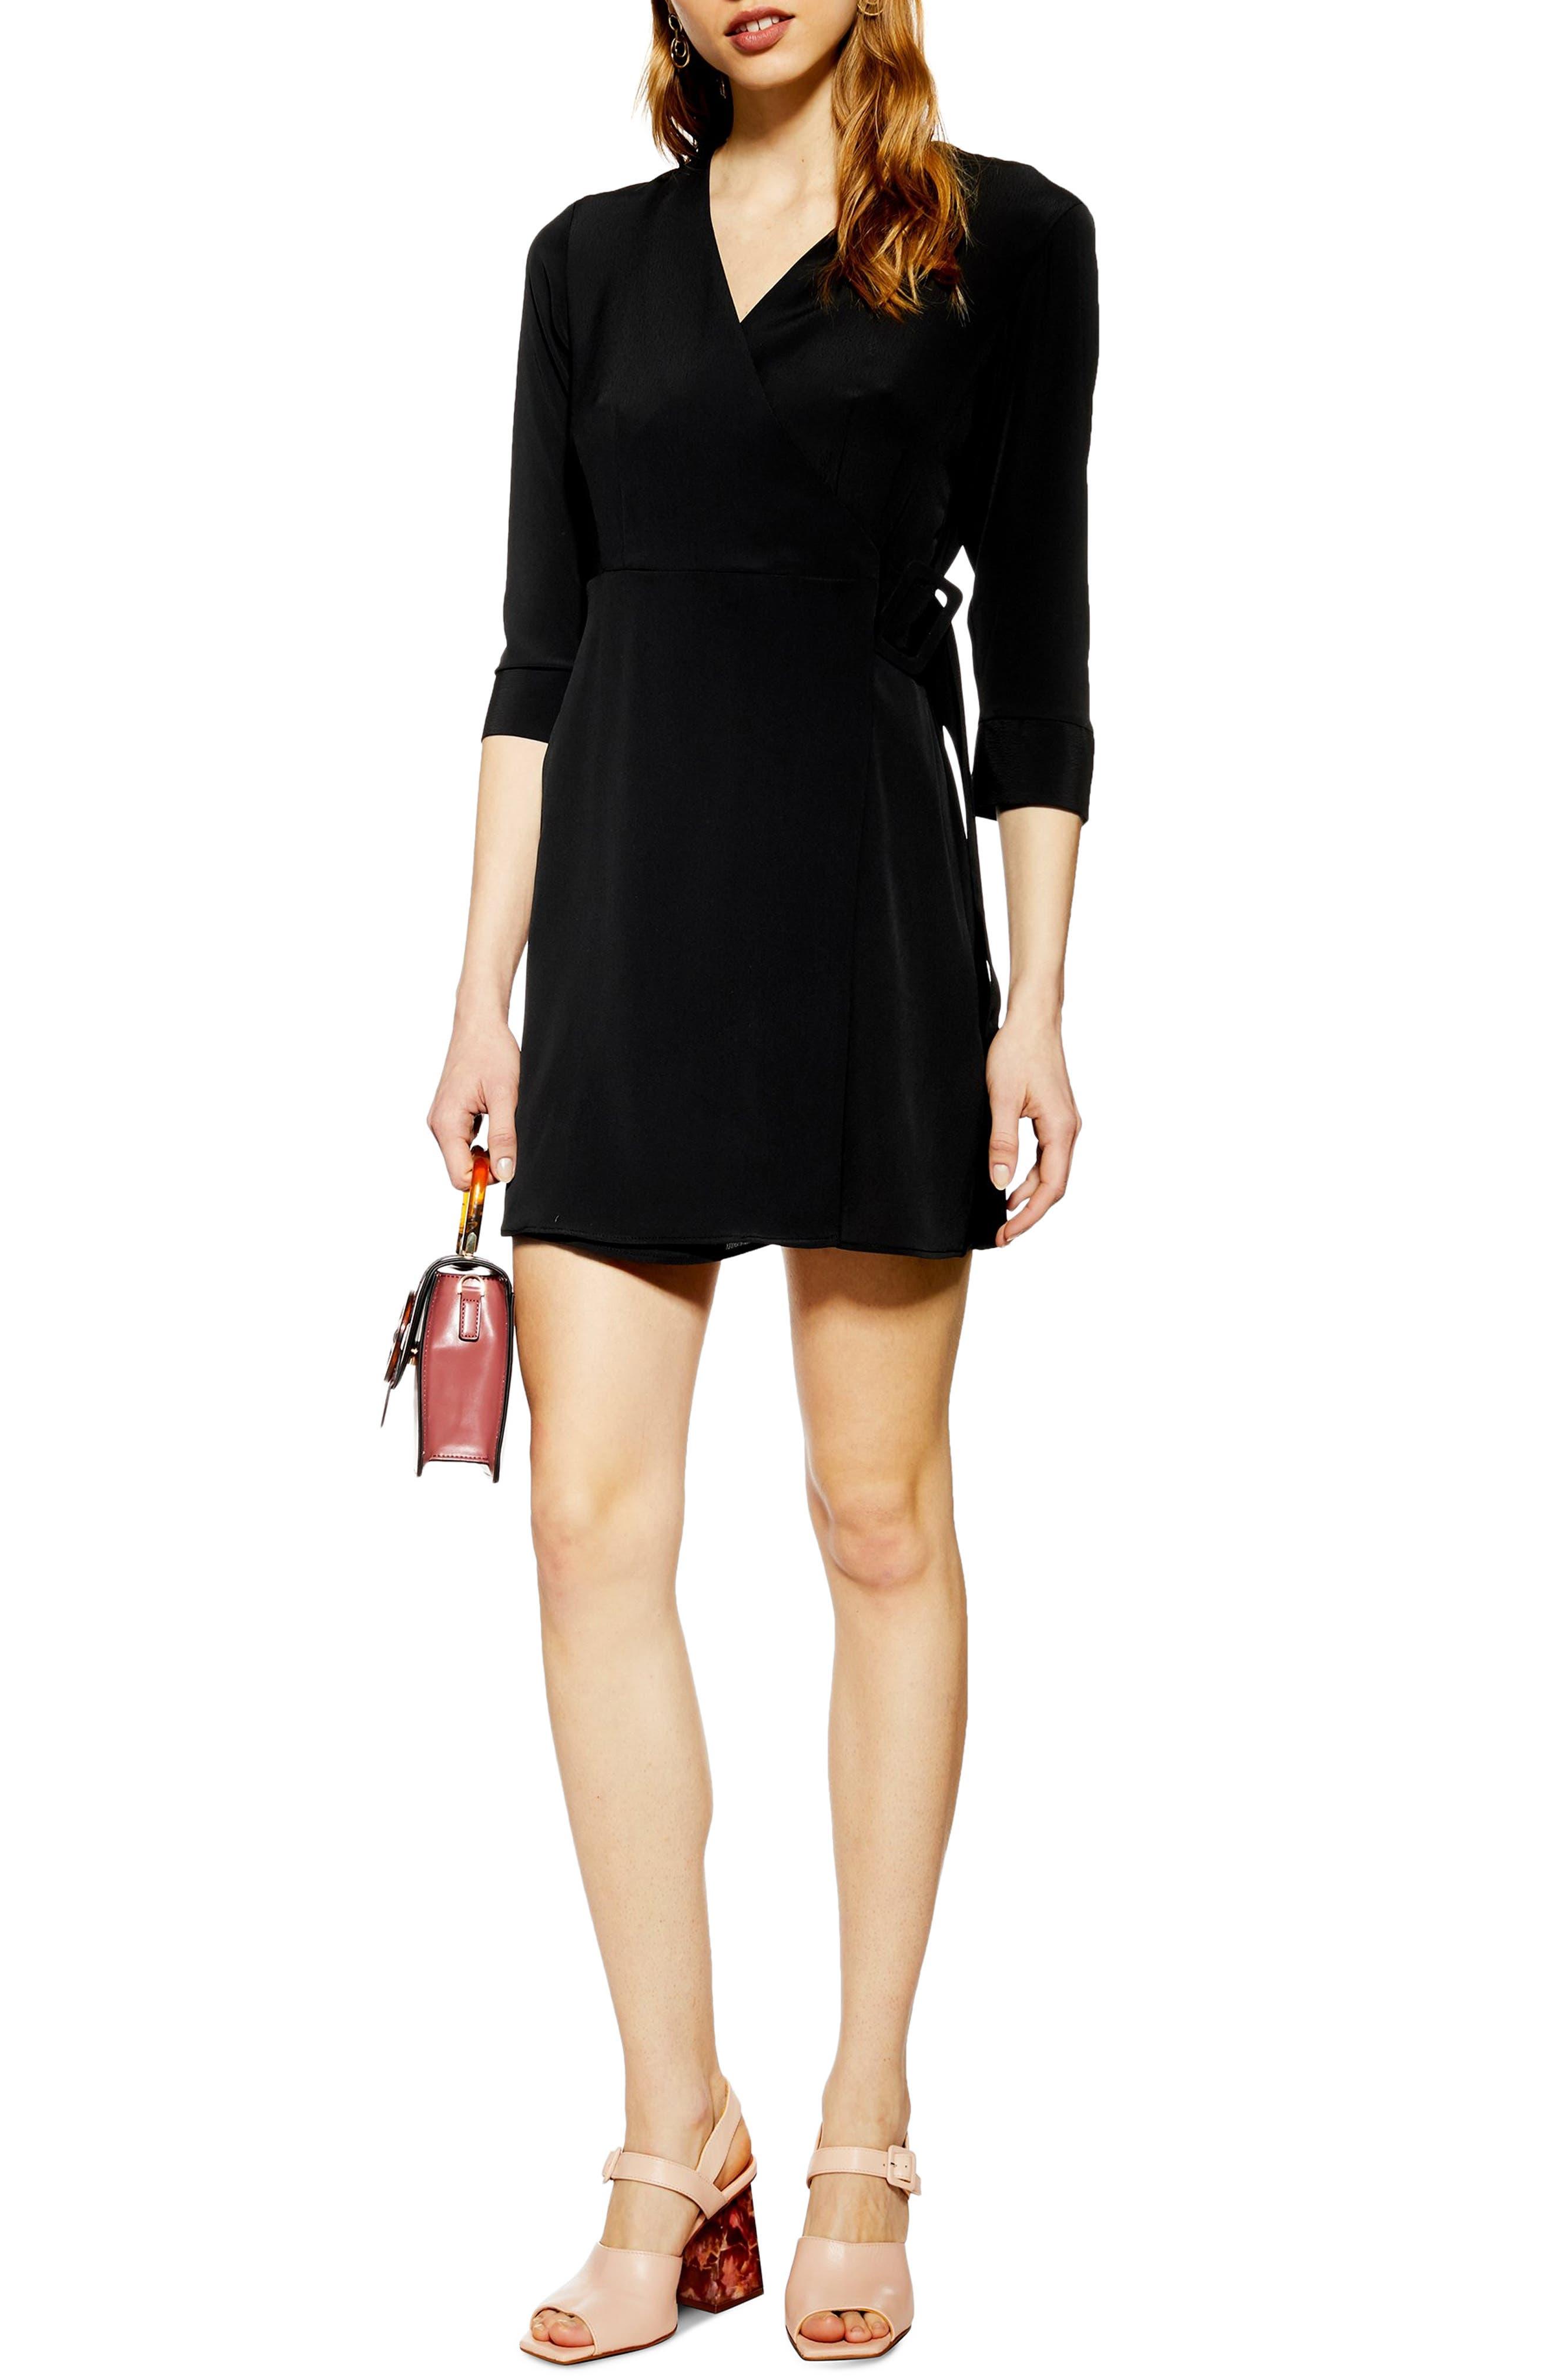 Topshop Wrap Minidress, US (fits like 2-4) - Black